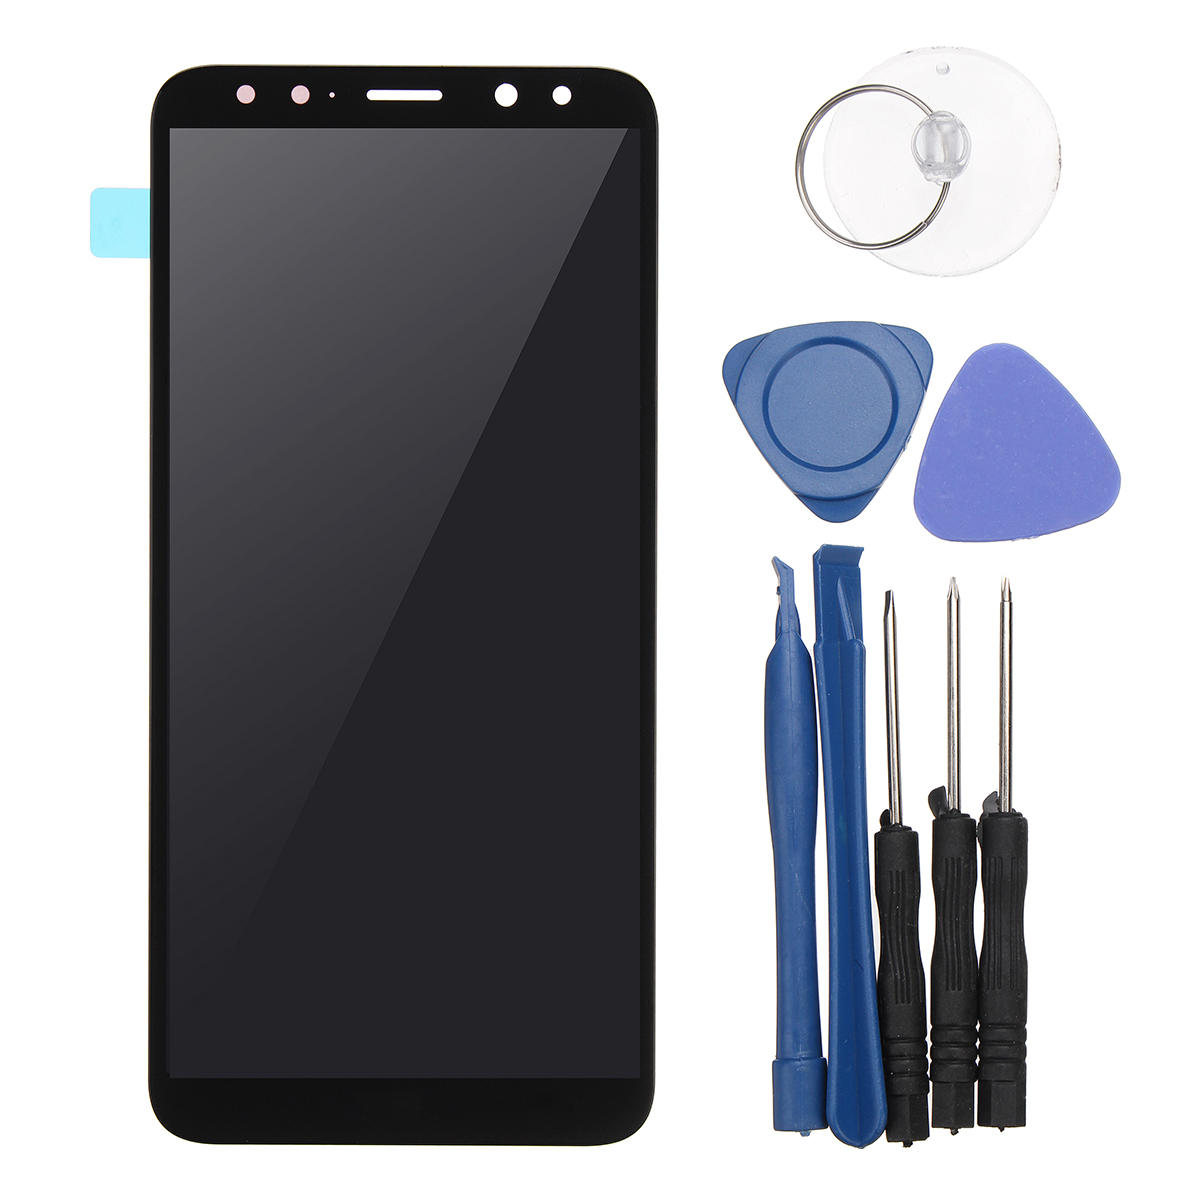 LCD Дисплей + сенсорный экран планшета замена с ремонтом Набор для Huawei Mate 10 Lite 5,9